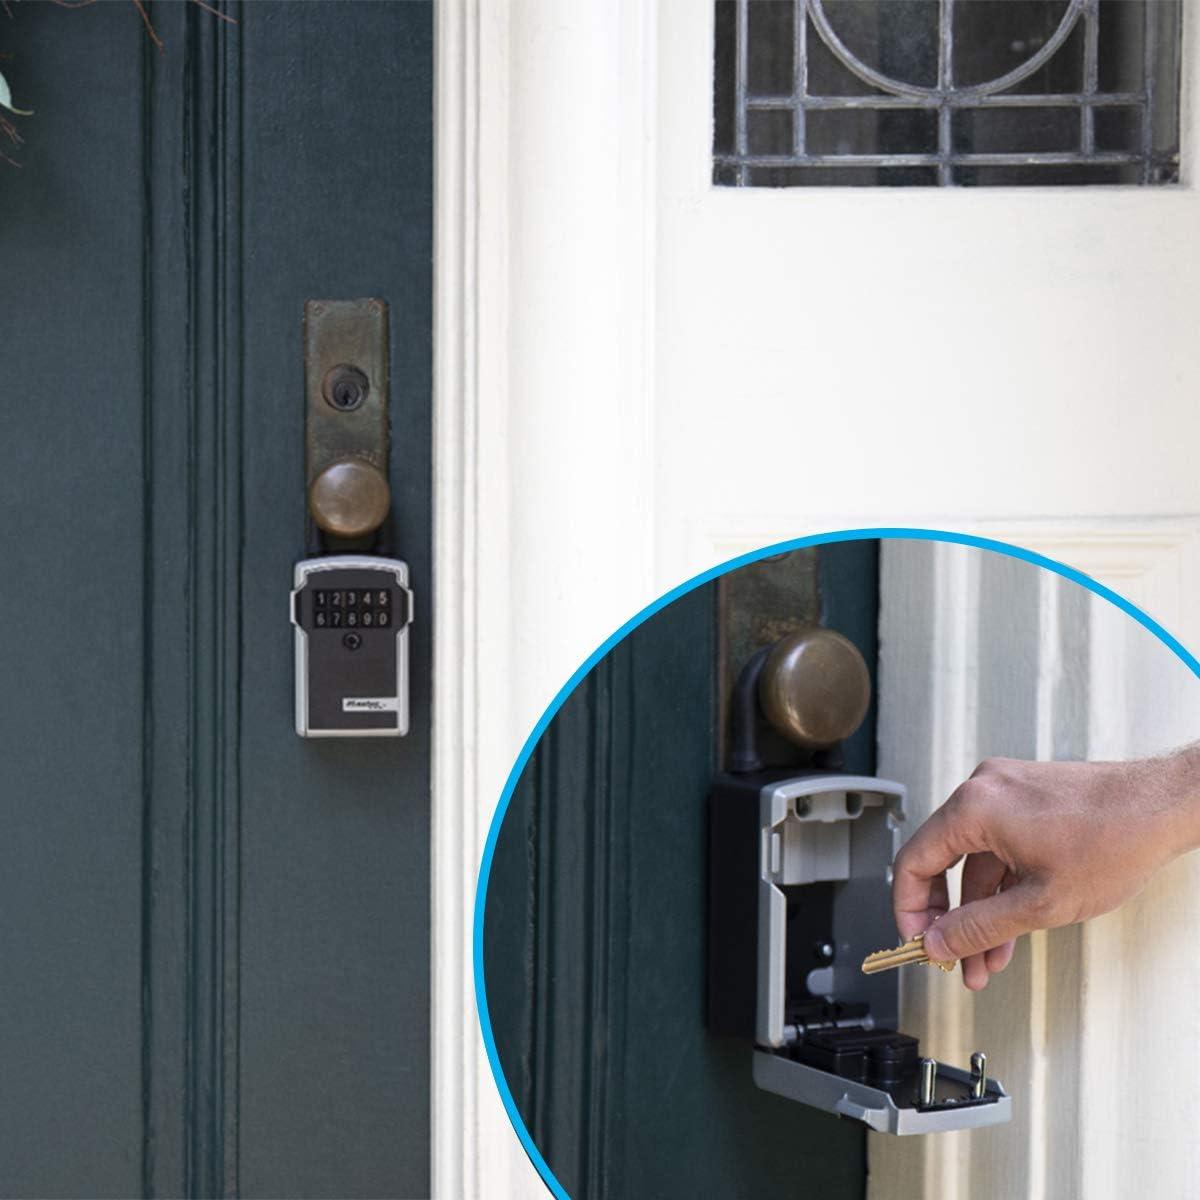 5424EURD Impermeable Con arco MASTER LOCK Caja fuerte para llaves retroiluminada Mediana Caja de seguridad